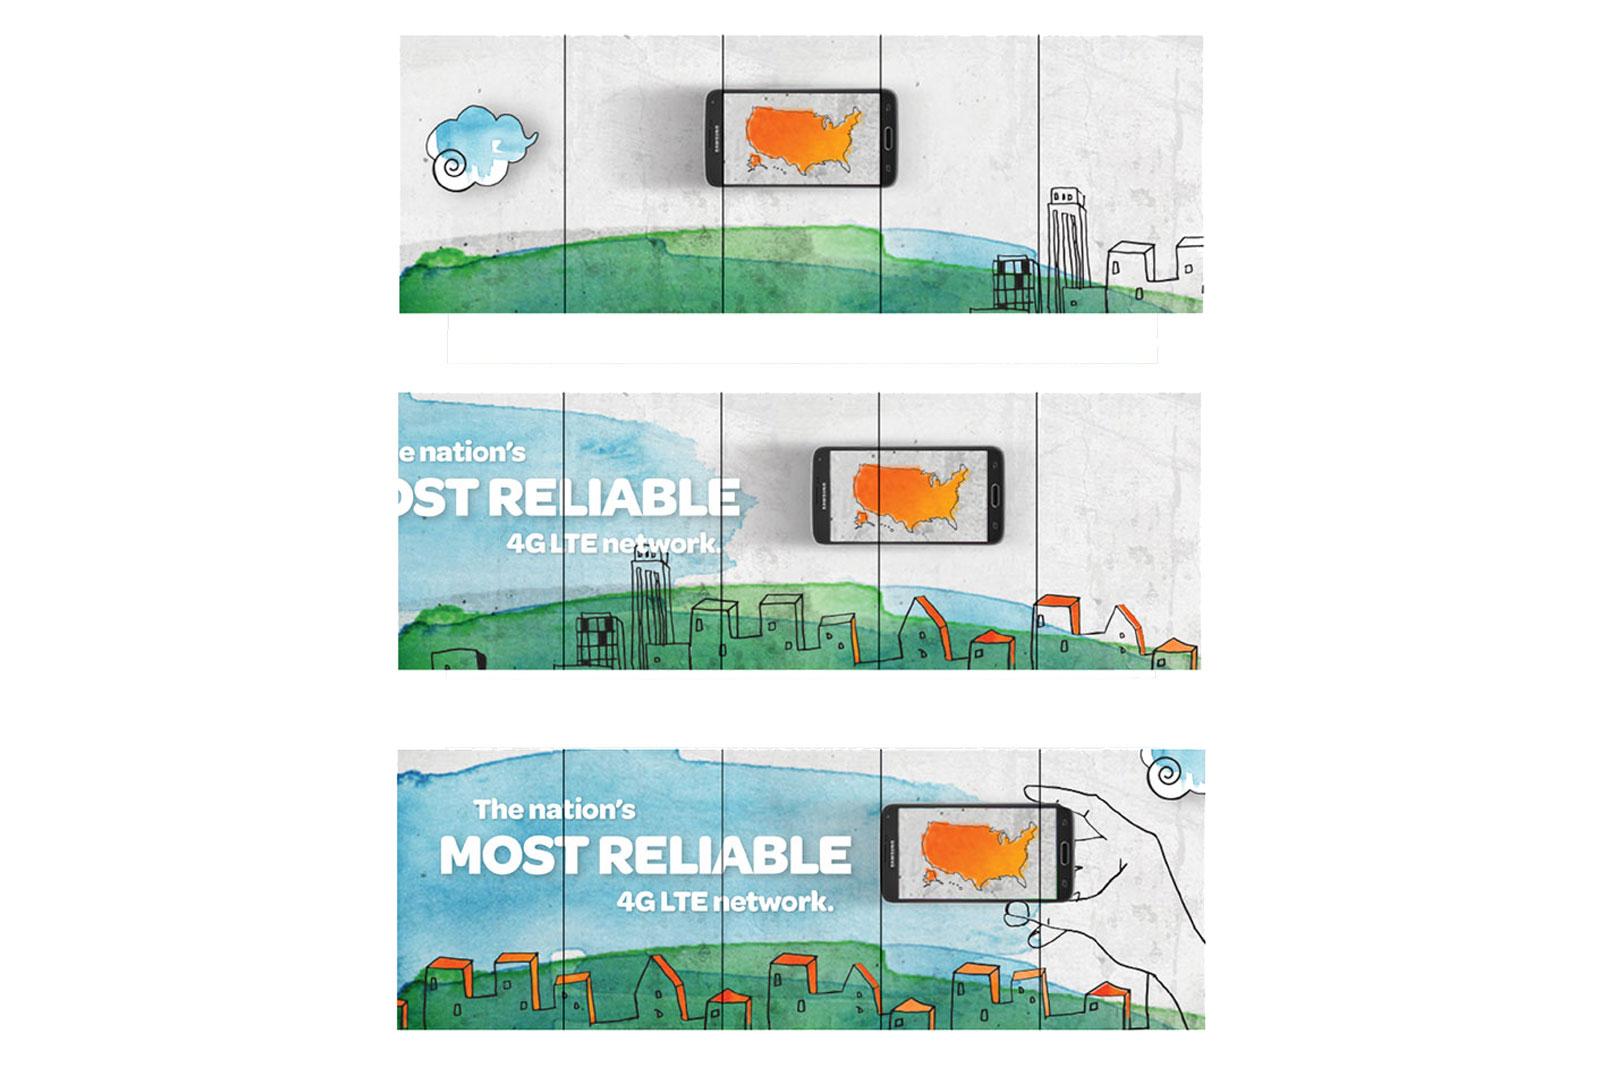 AT&T Retail Experience - Digital signage progression